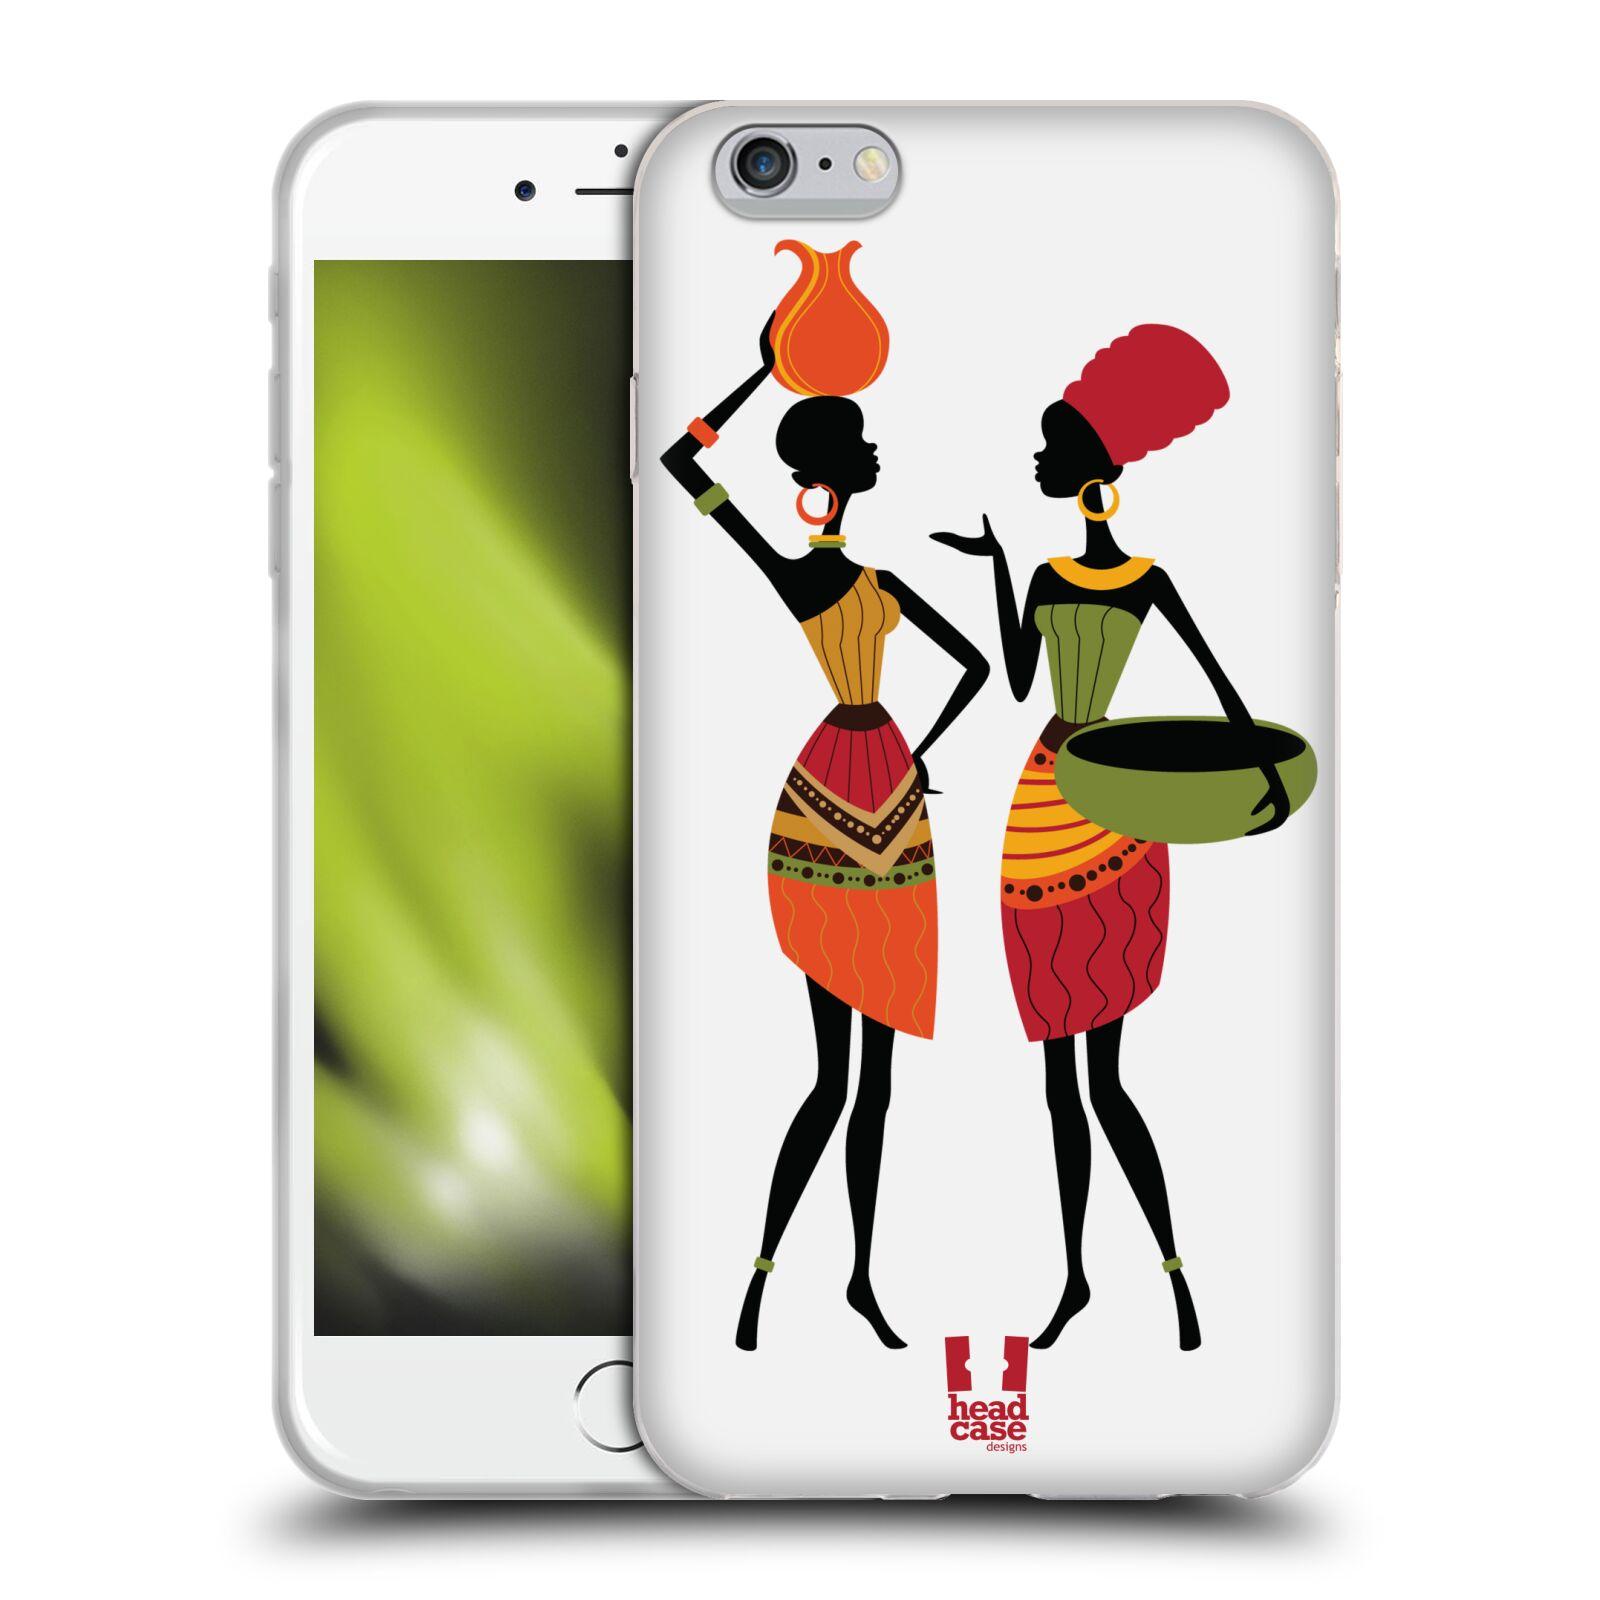 HEAD CASE silikonový obal na mobil Apple Iphone 6 PLUS/ 6S PLUS vzor Africké motivy DRBNY